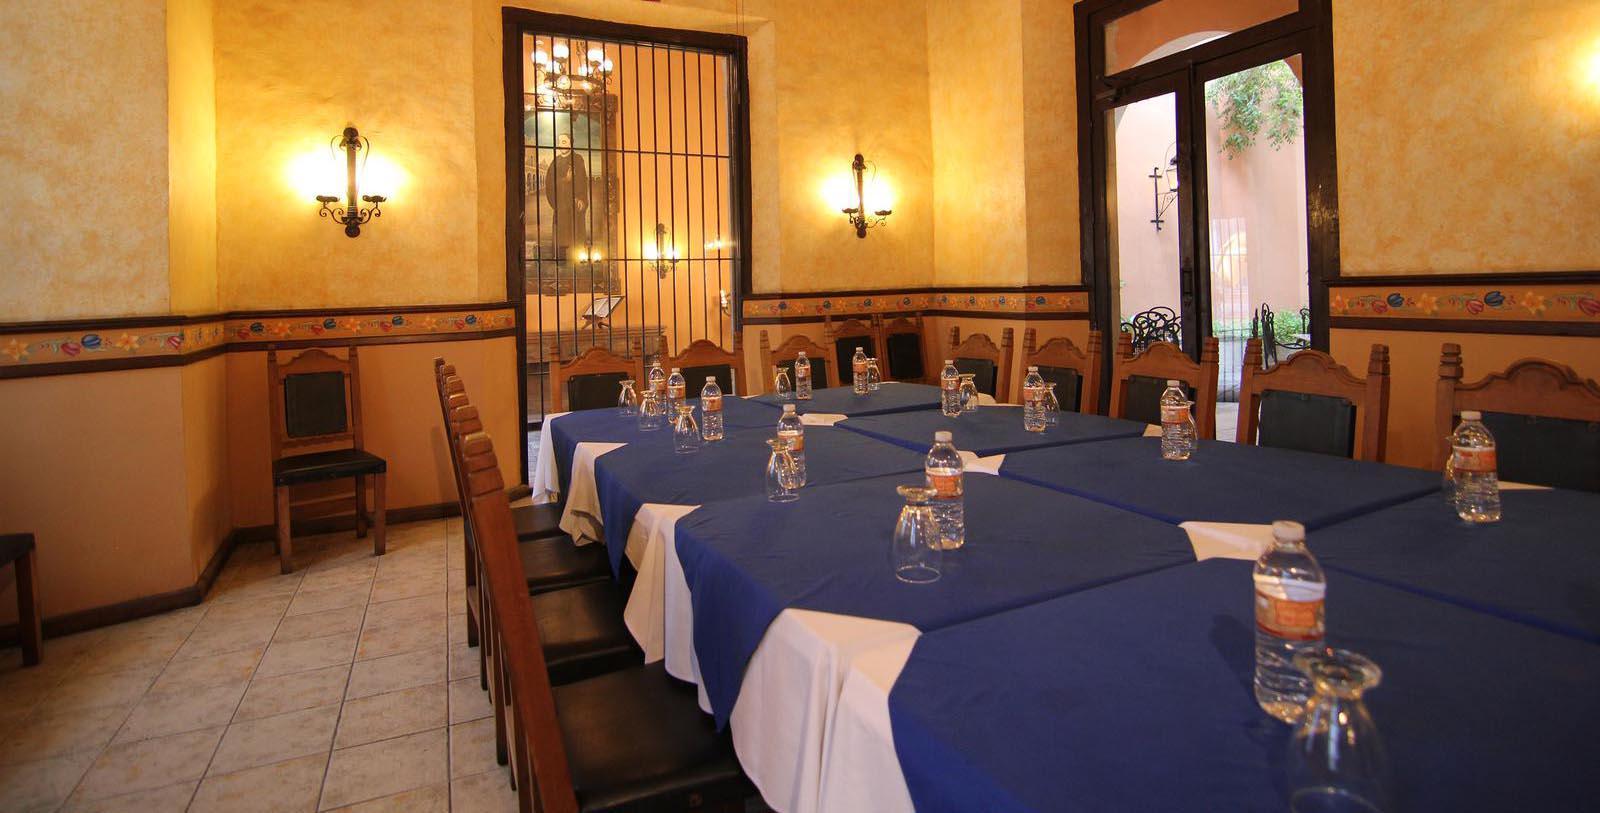 Image of Event Space La Misión de Fray Diego, 1867 Member of Historic Hotels Worldwide, in Merida, Mexico, Special Occasions